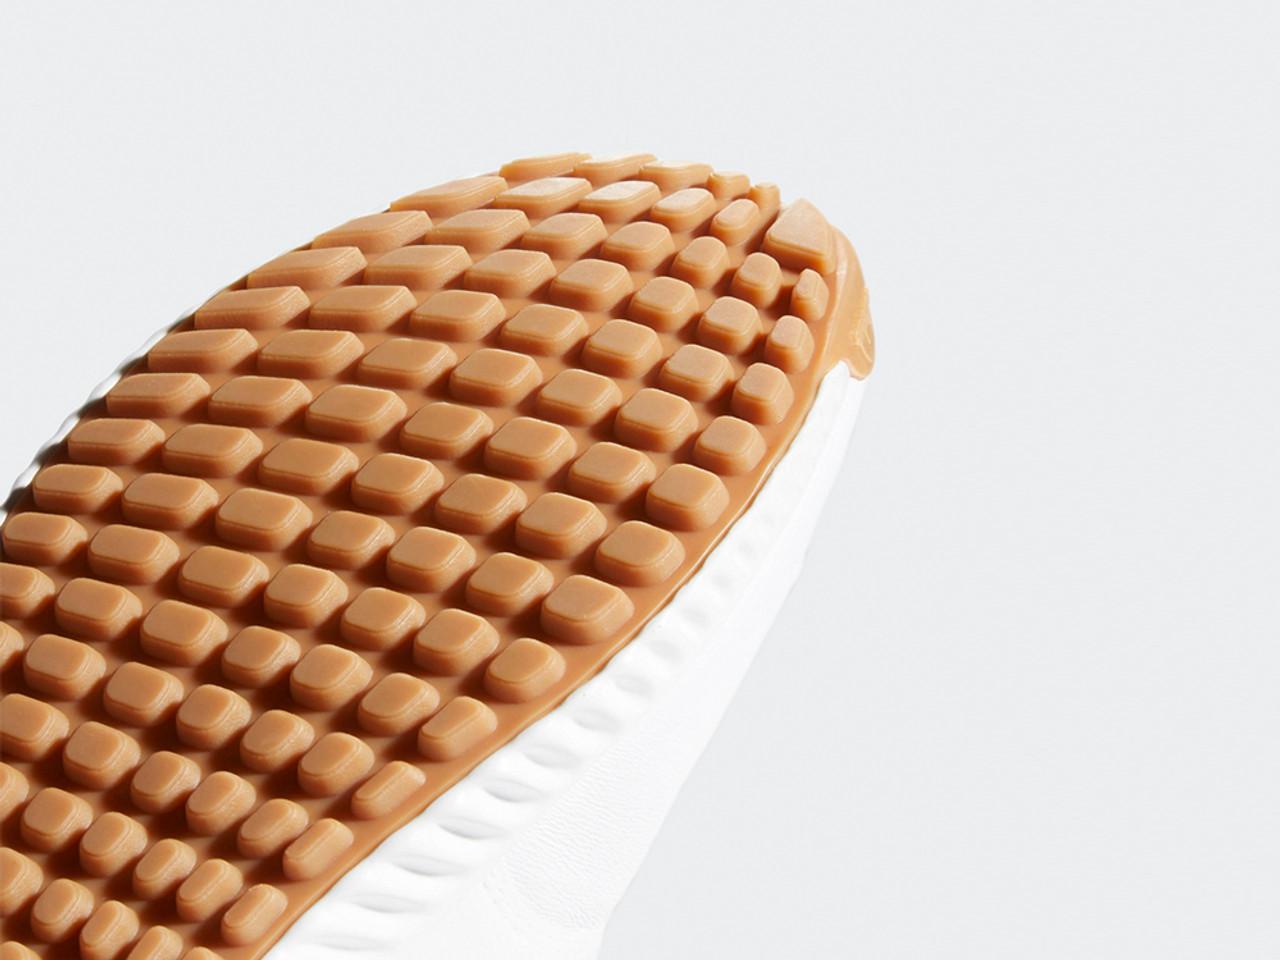 premium selection cda7d 7efb1 Adidas Adicross Bounce Leather Golf Shoes - FTWR WhiteGrey